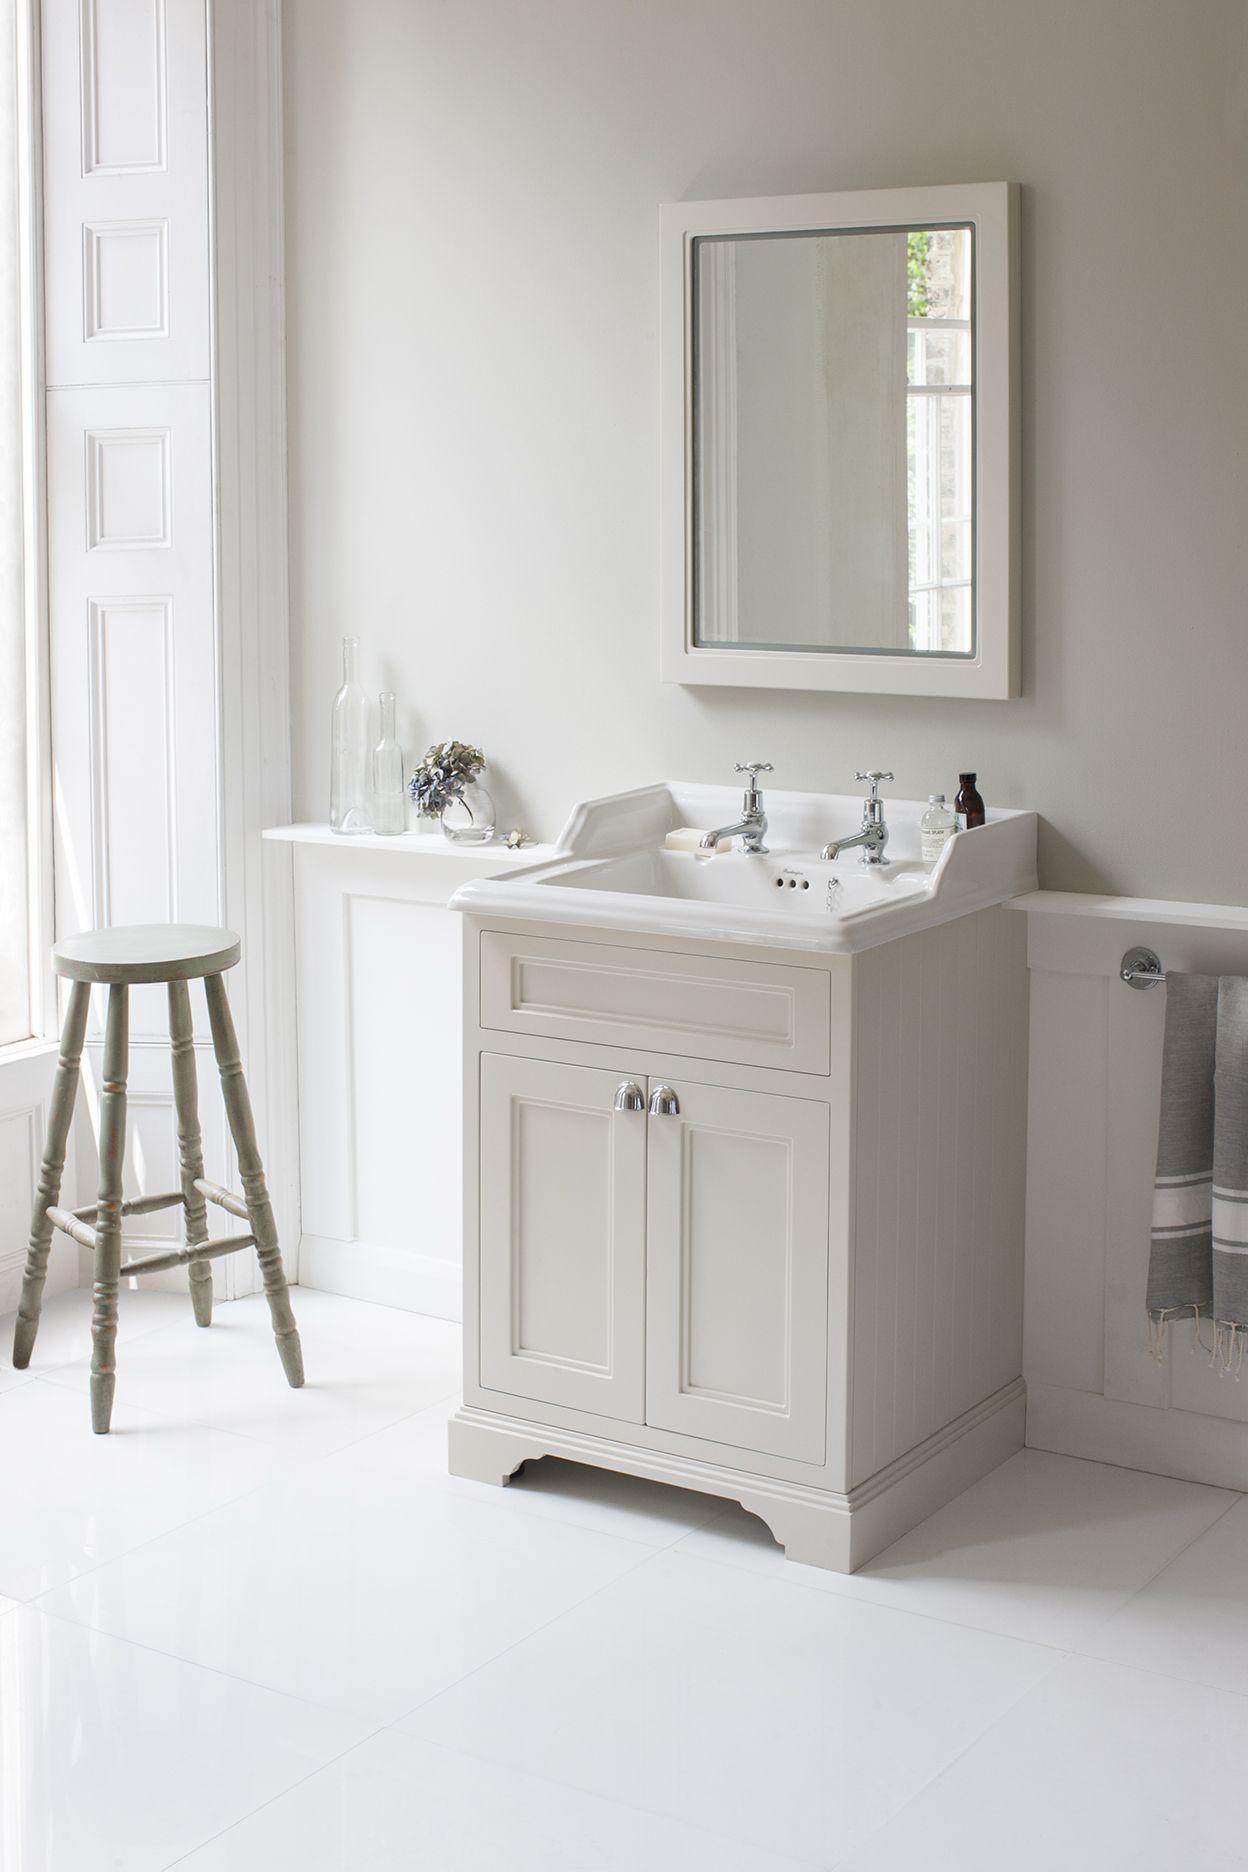 Victorian Dry Sink Style Bathroom Vanity Sink Top But Where To Find Buy Luxurybathroomnames Victorian Bathroom Bathroom Vanity Units